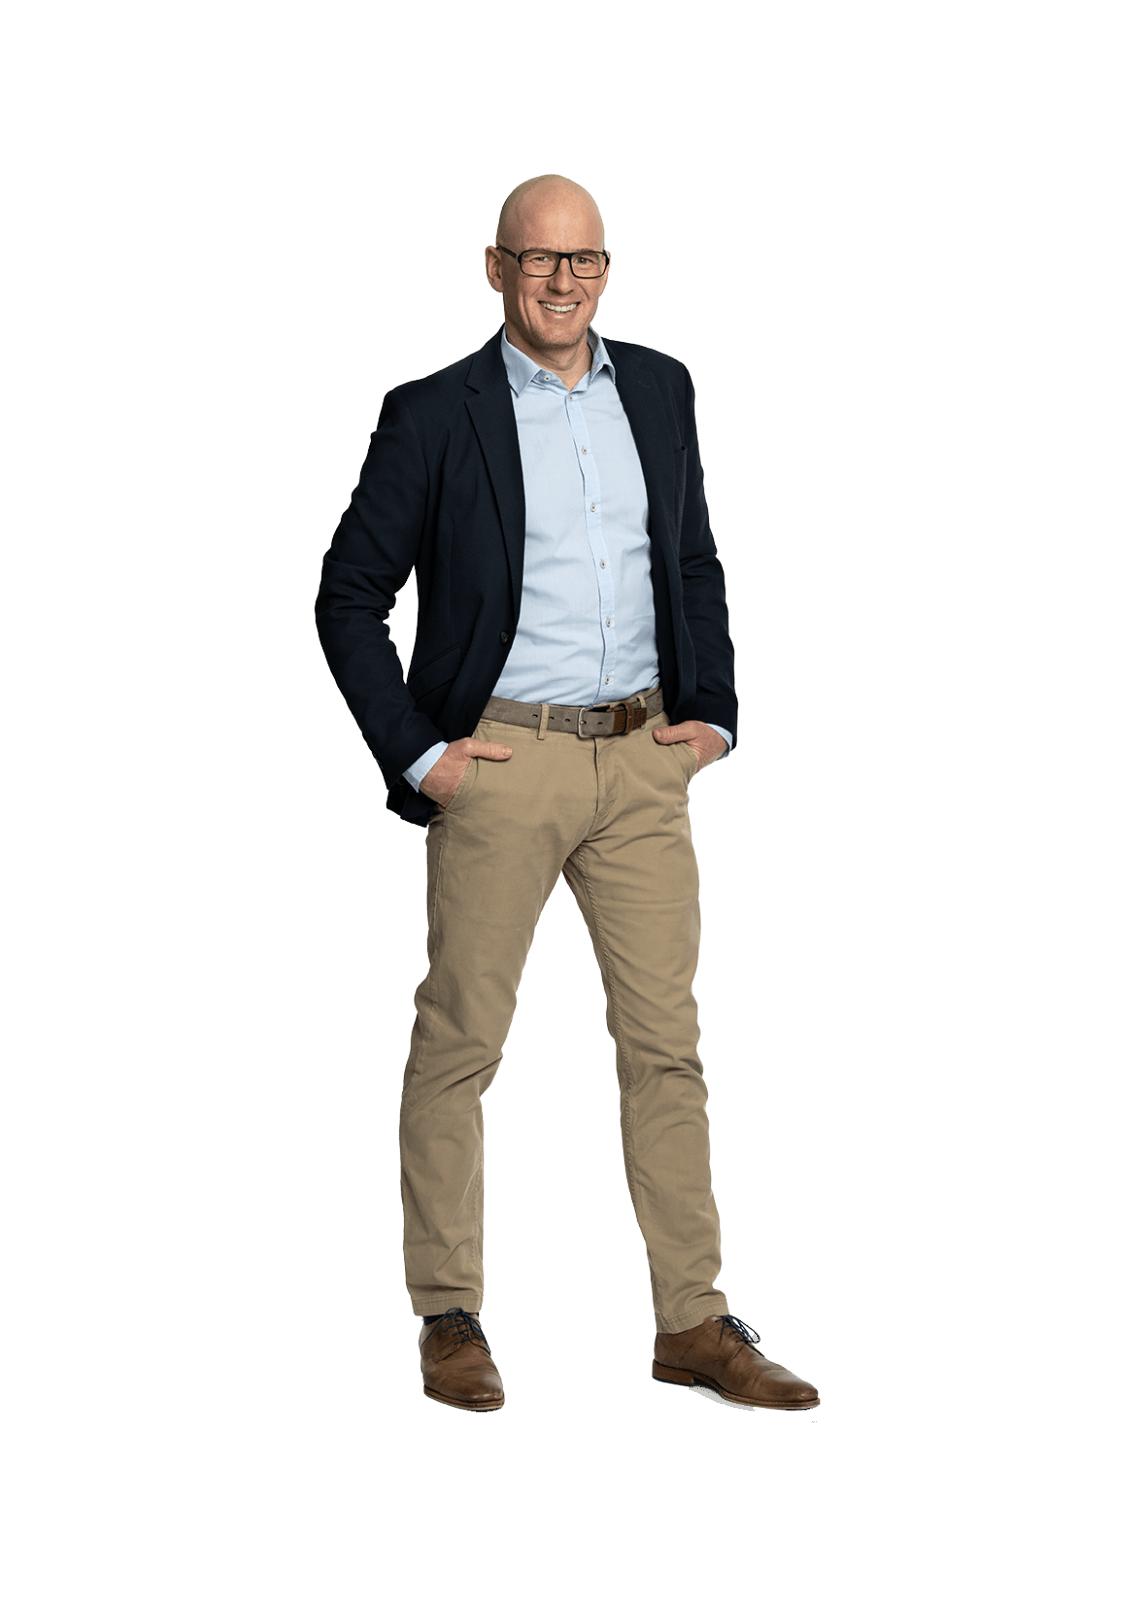 Volker Hurth